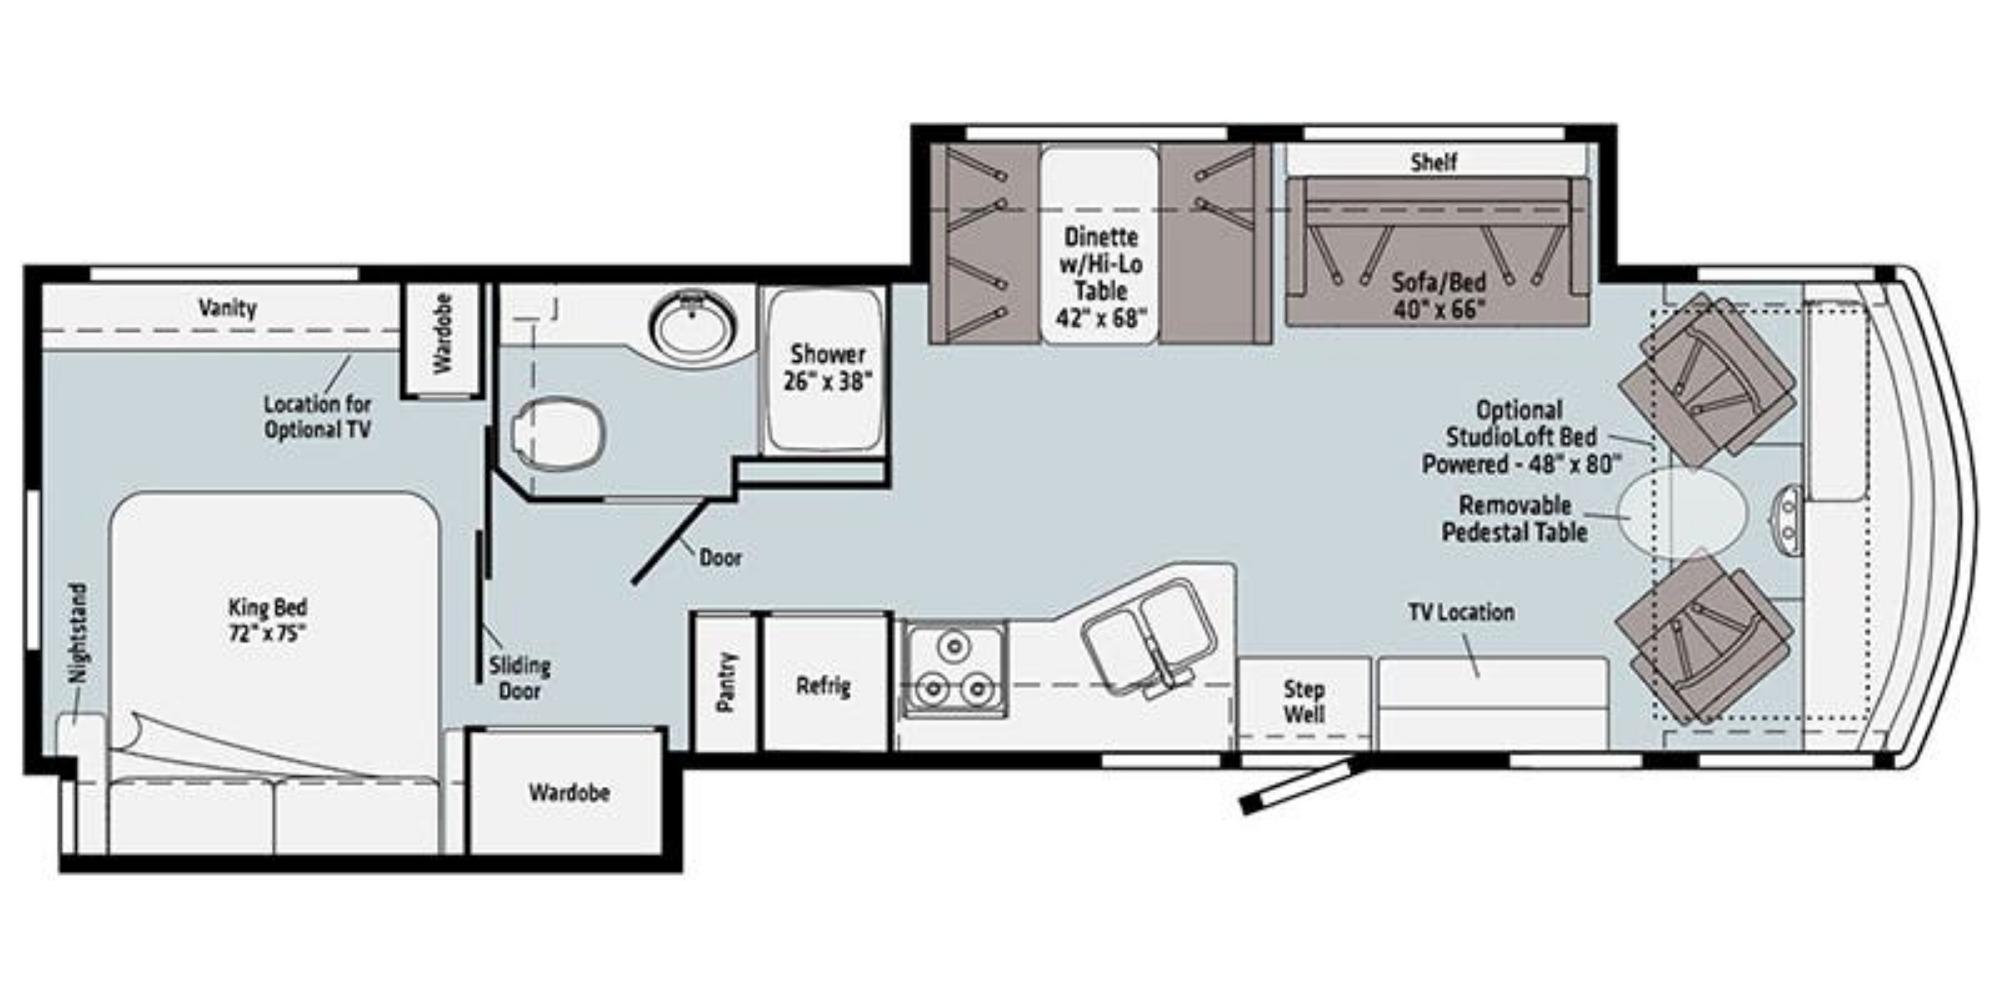 View Floor Plan for 2021 WINNEBAGO VISTA 35U